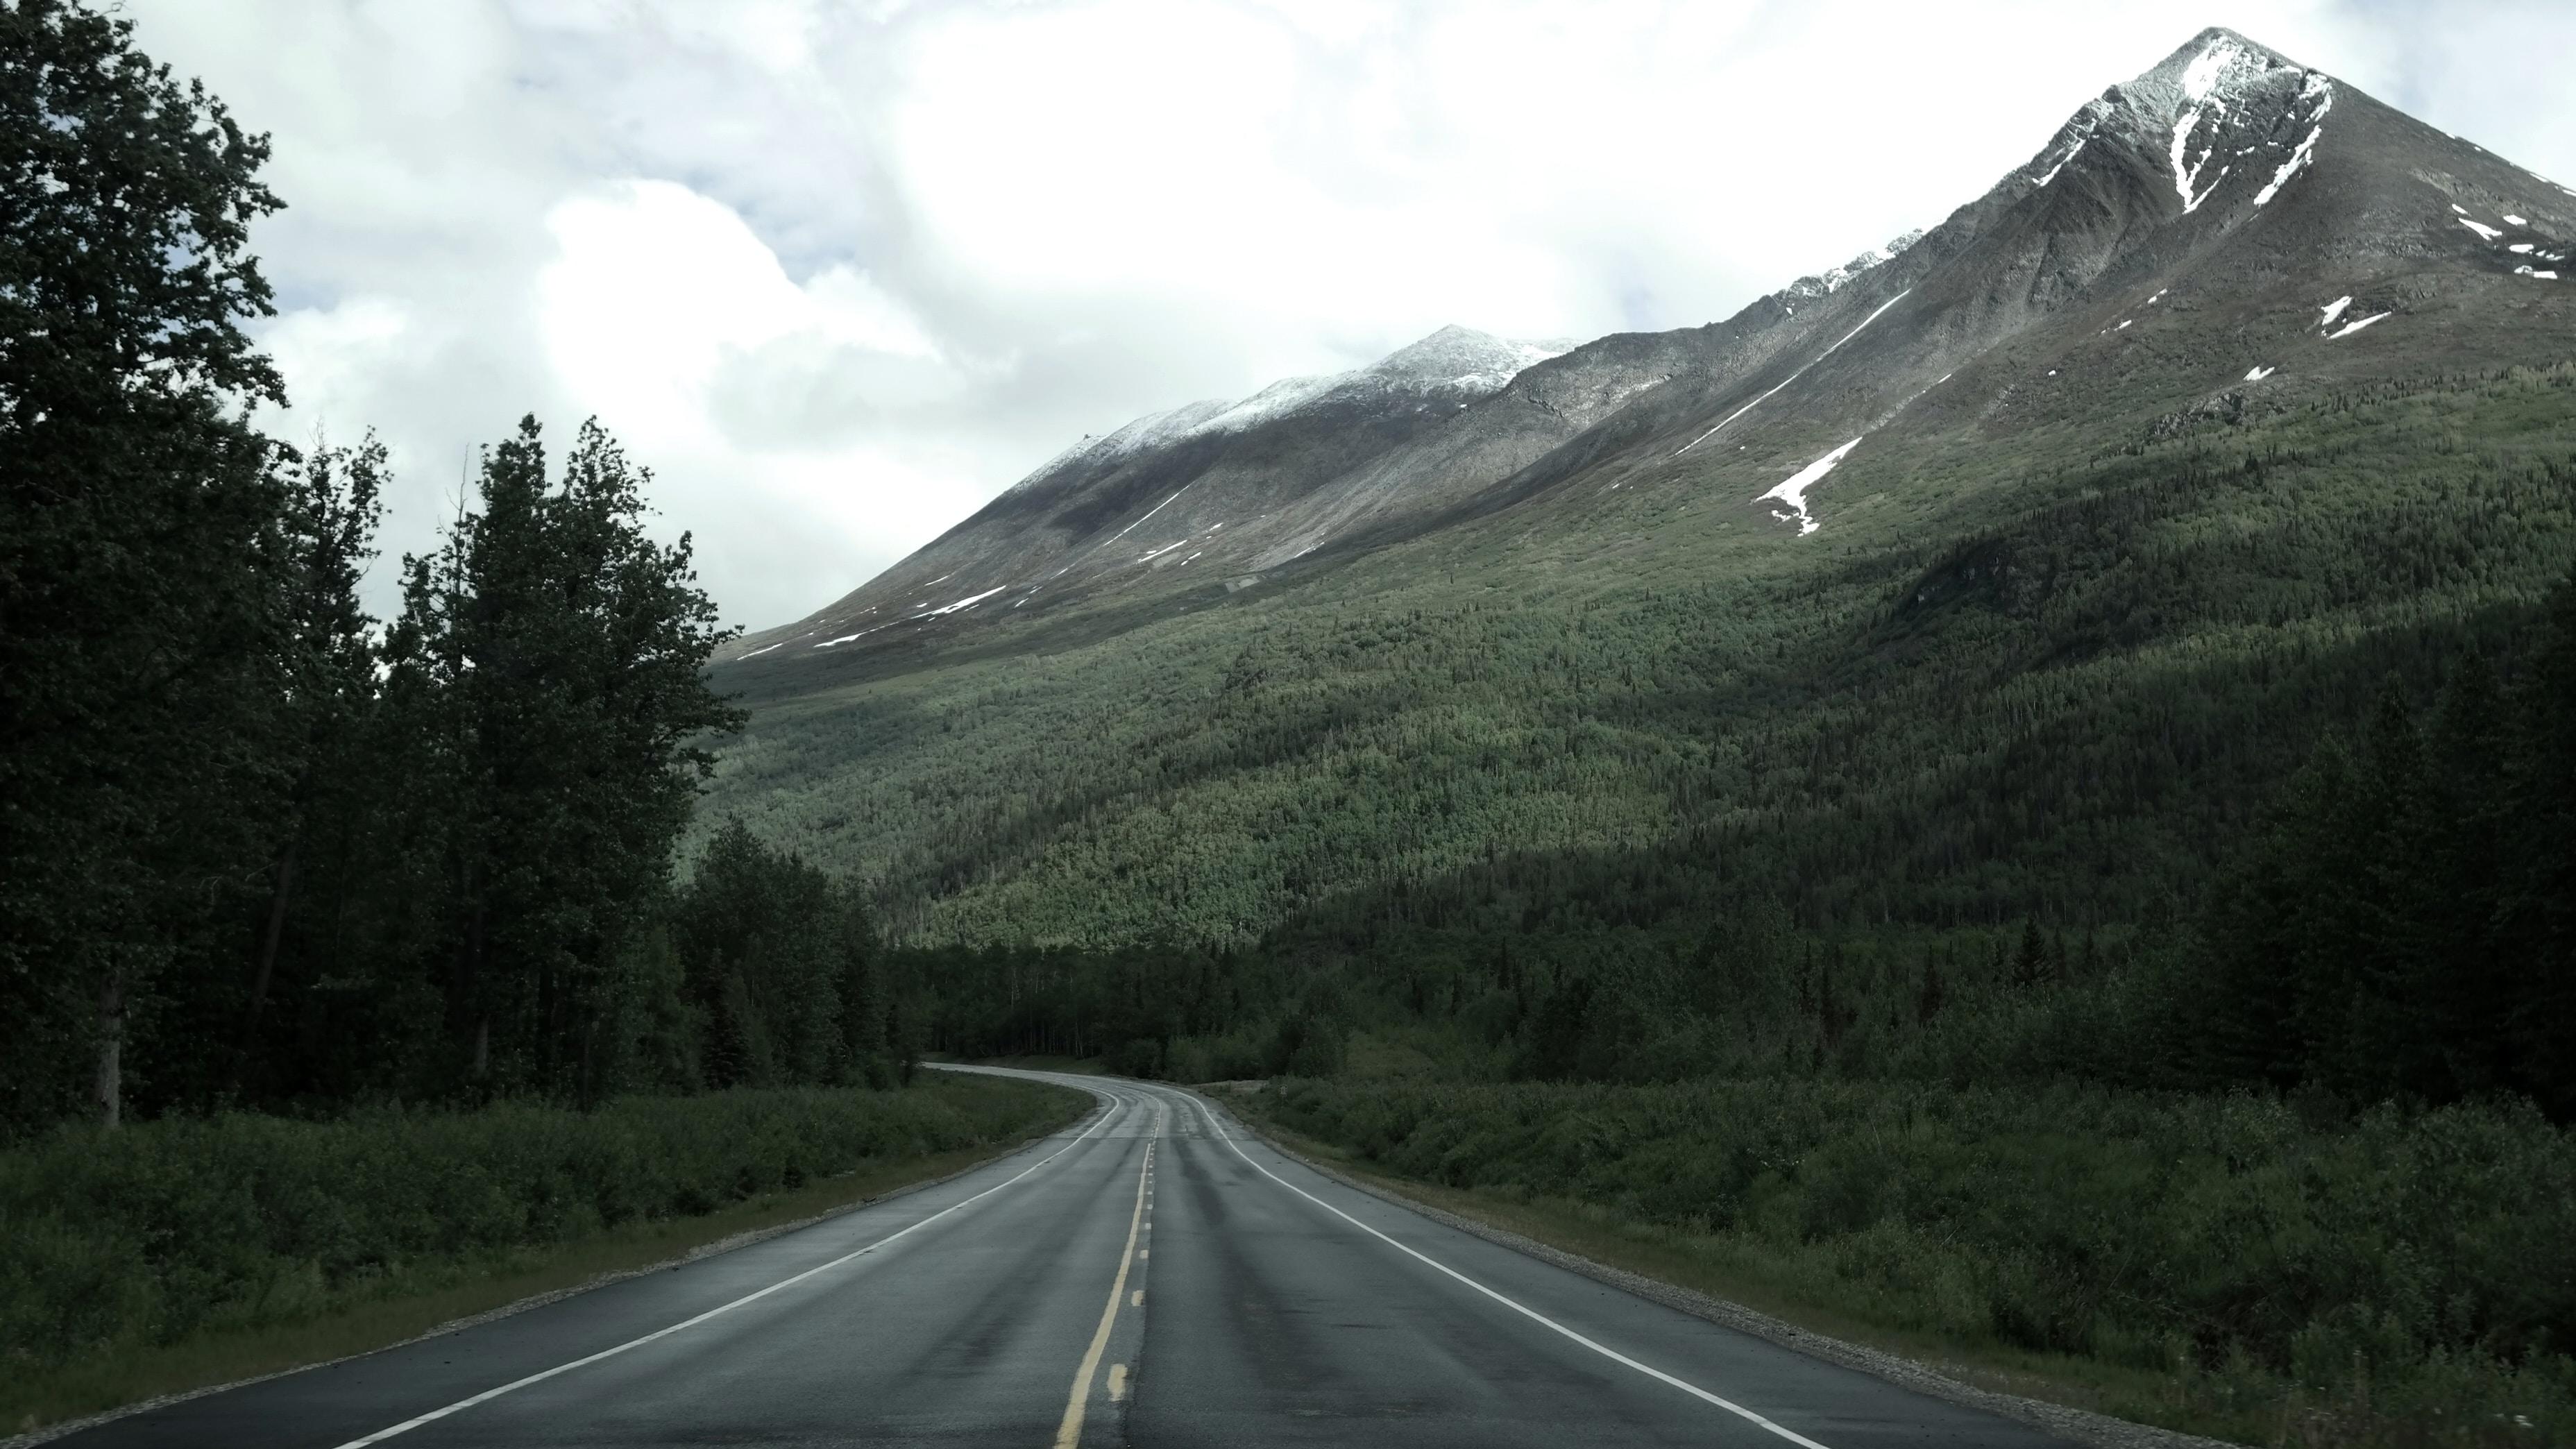 gray asphalt road in between green trees